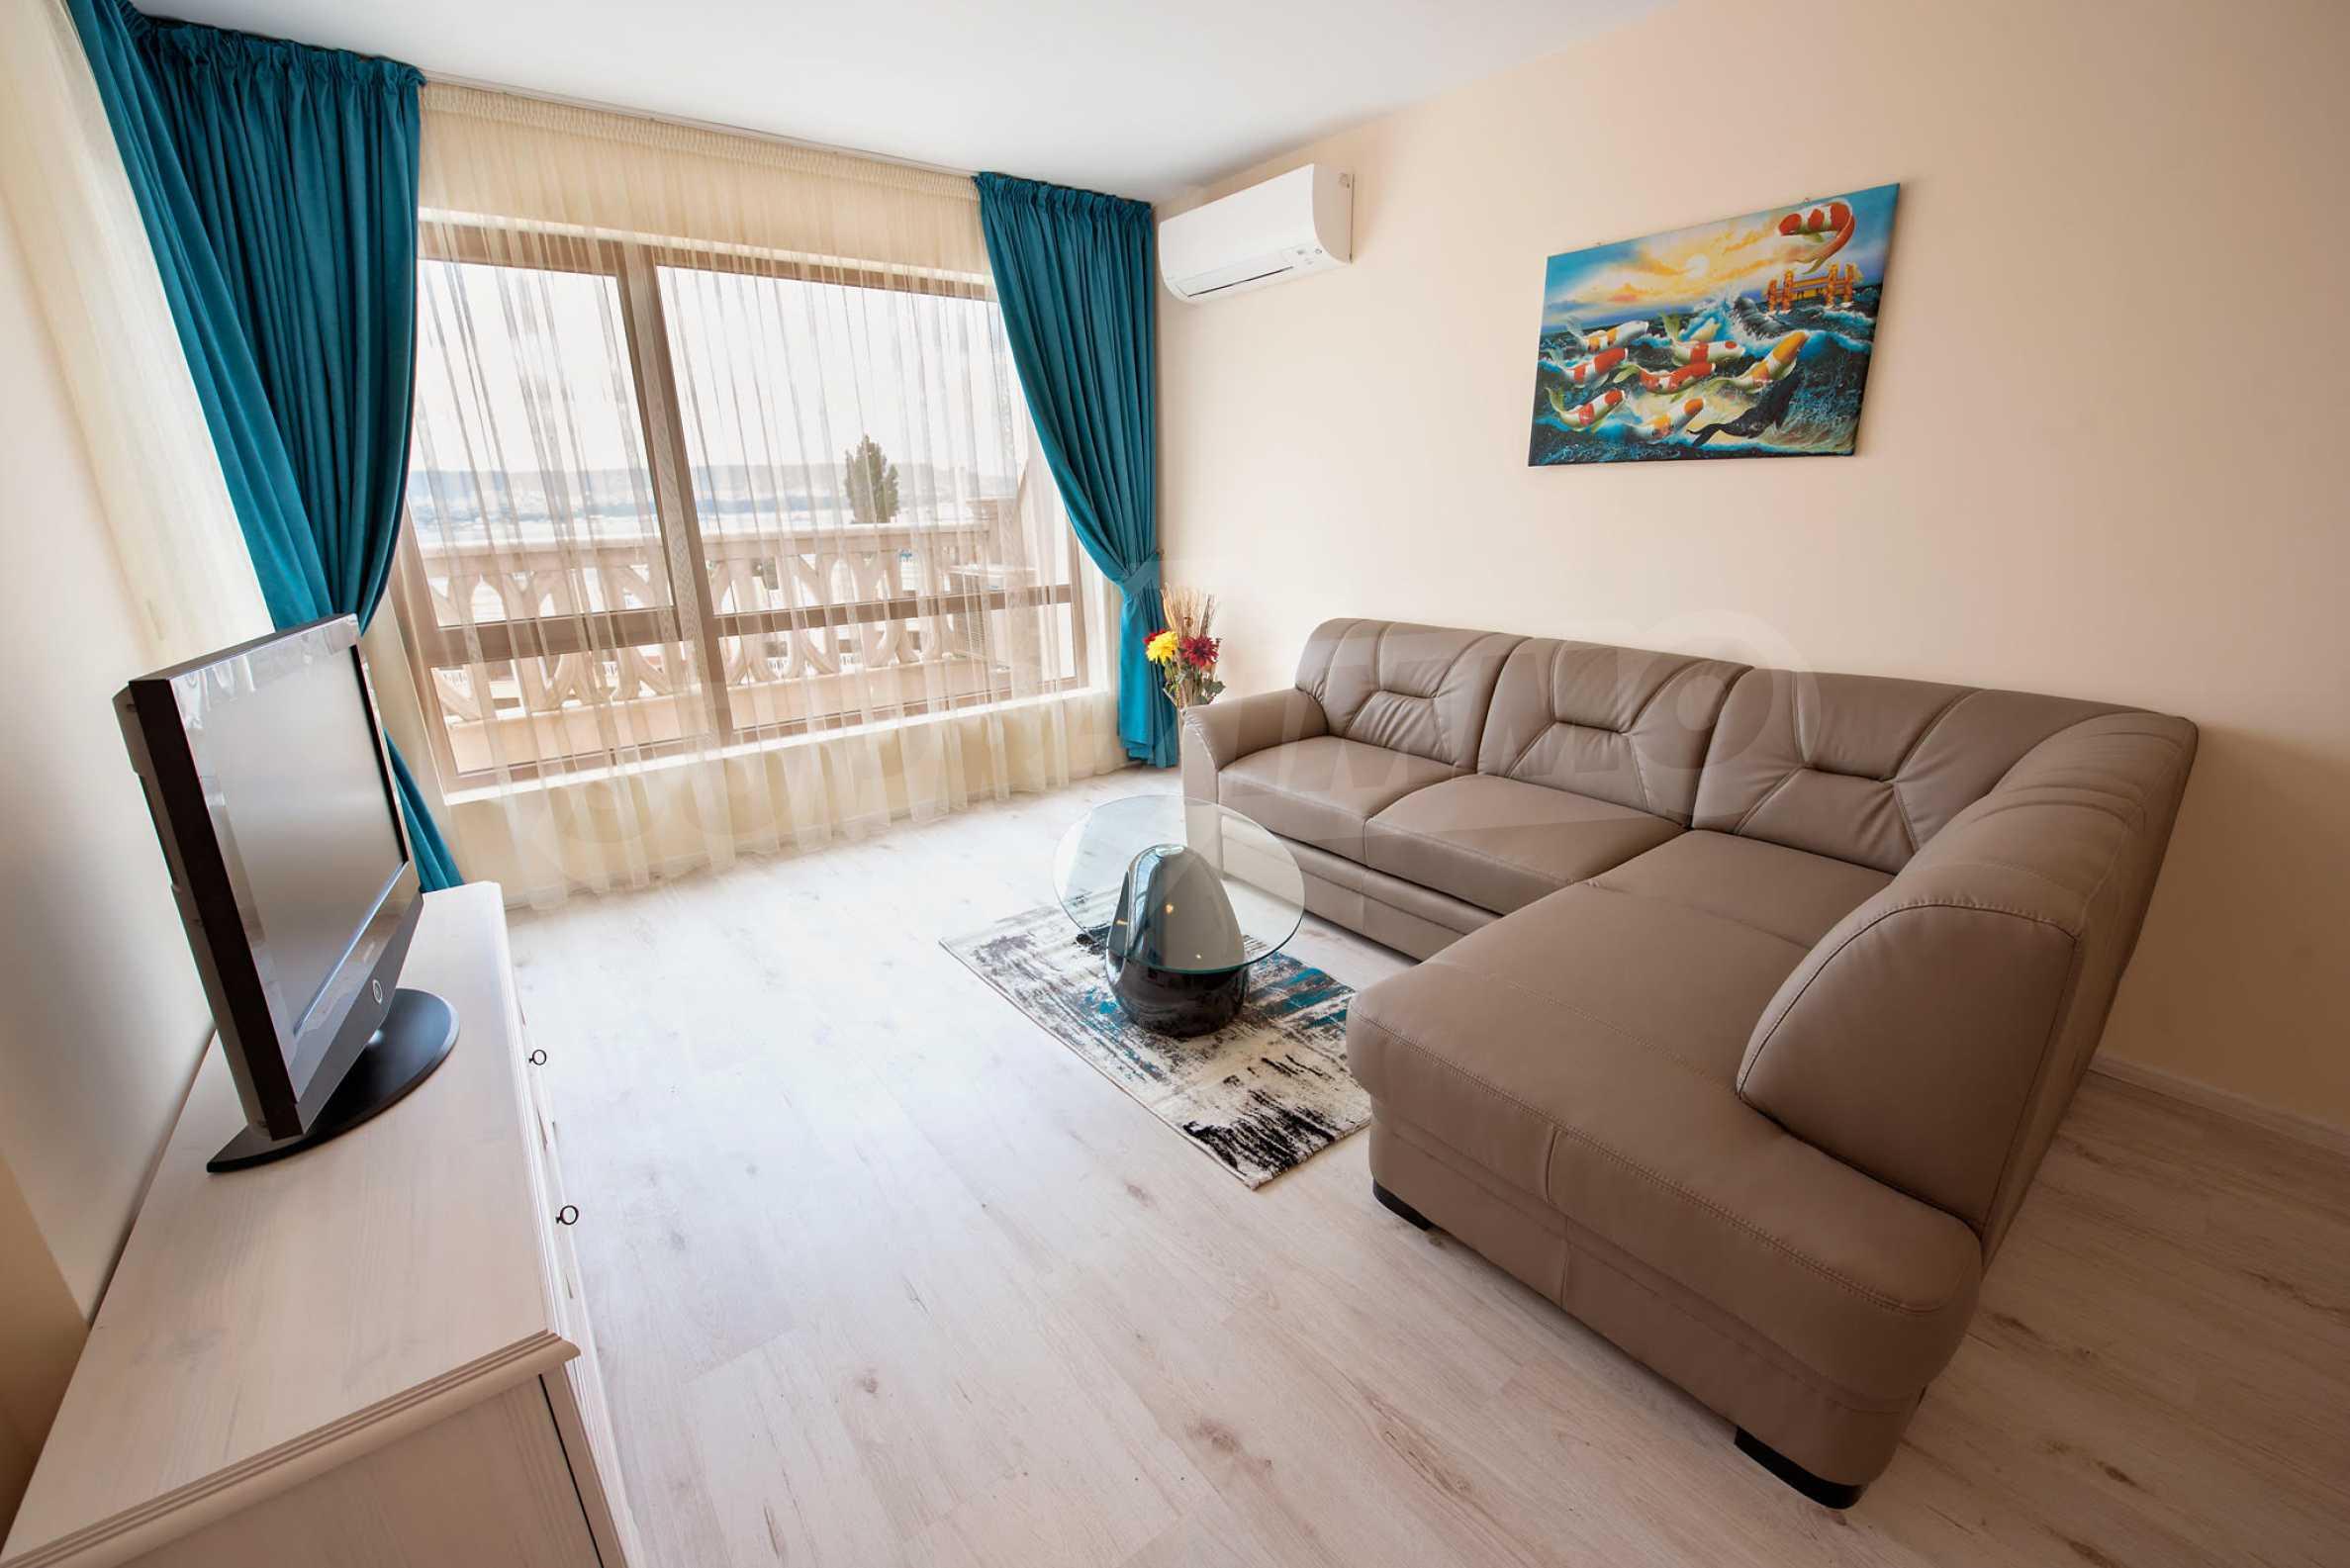 Двустаен апартамент във Варна Саут Бей / Varna South Bay 3